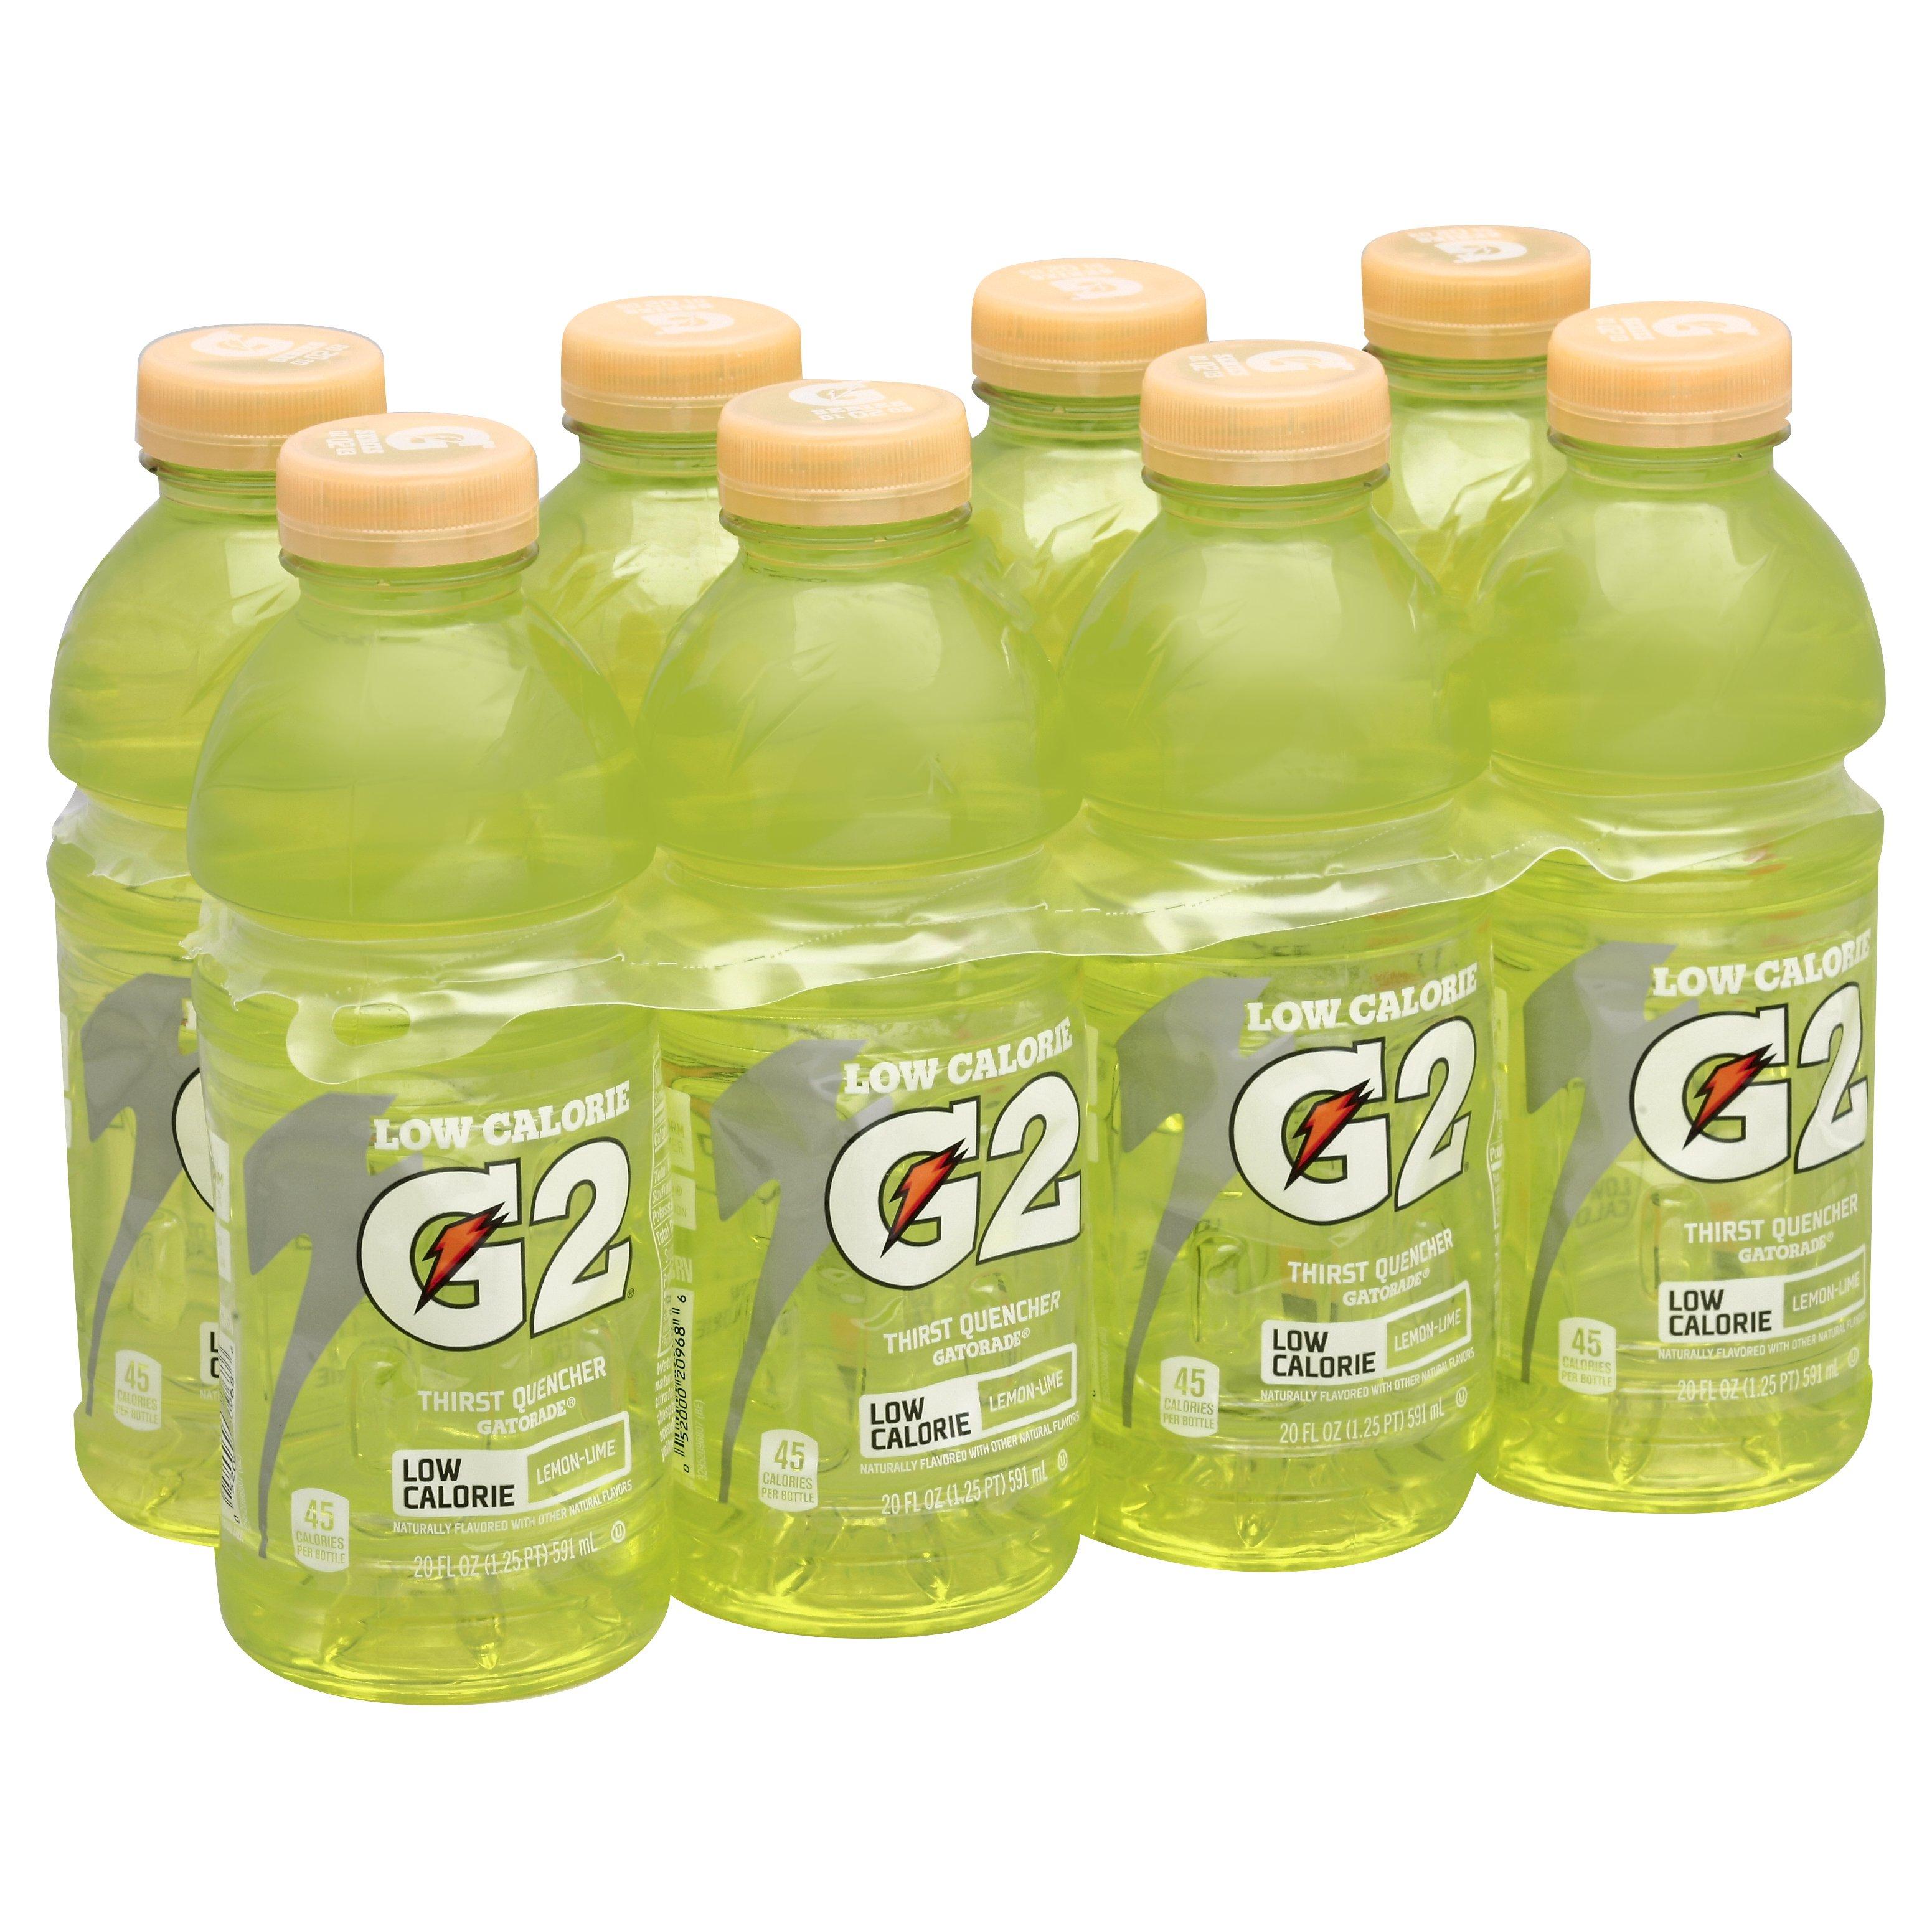 Gatorade Perform 02 Lemon-Lime Sports Drink 160OZ 3-Pack